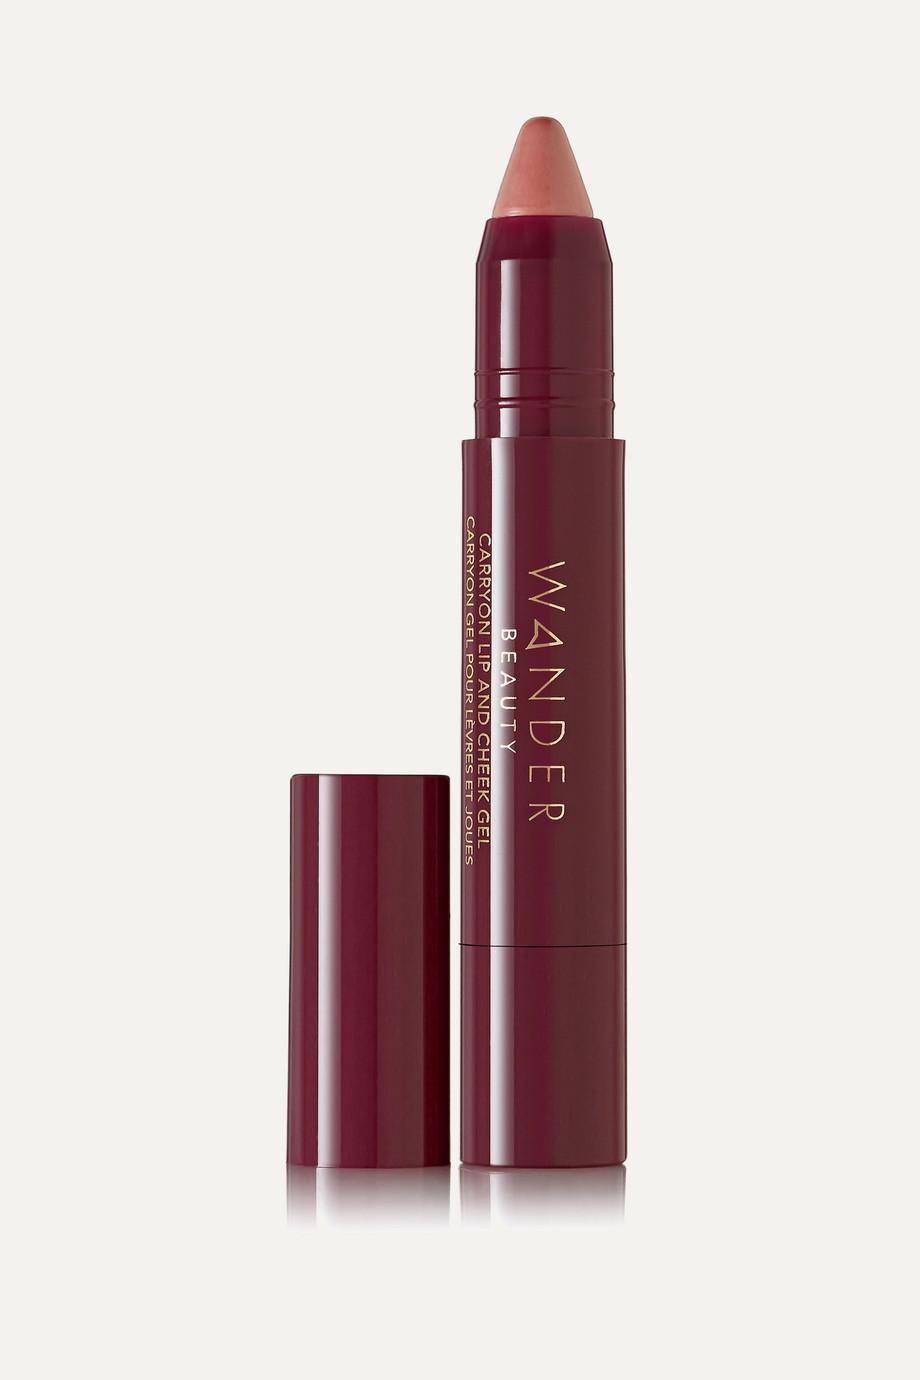 Wander Beauty Carryon Lip and Cheek Gel – Madisoness – Lippen- und Wangenfarbe